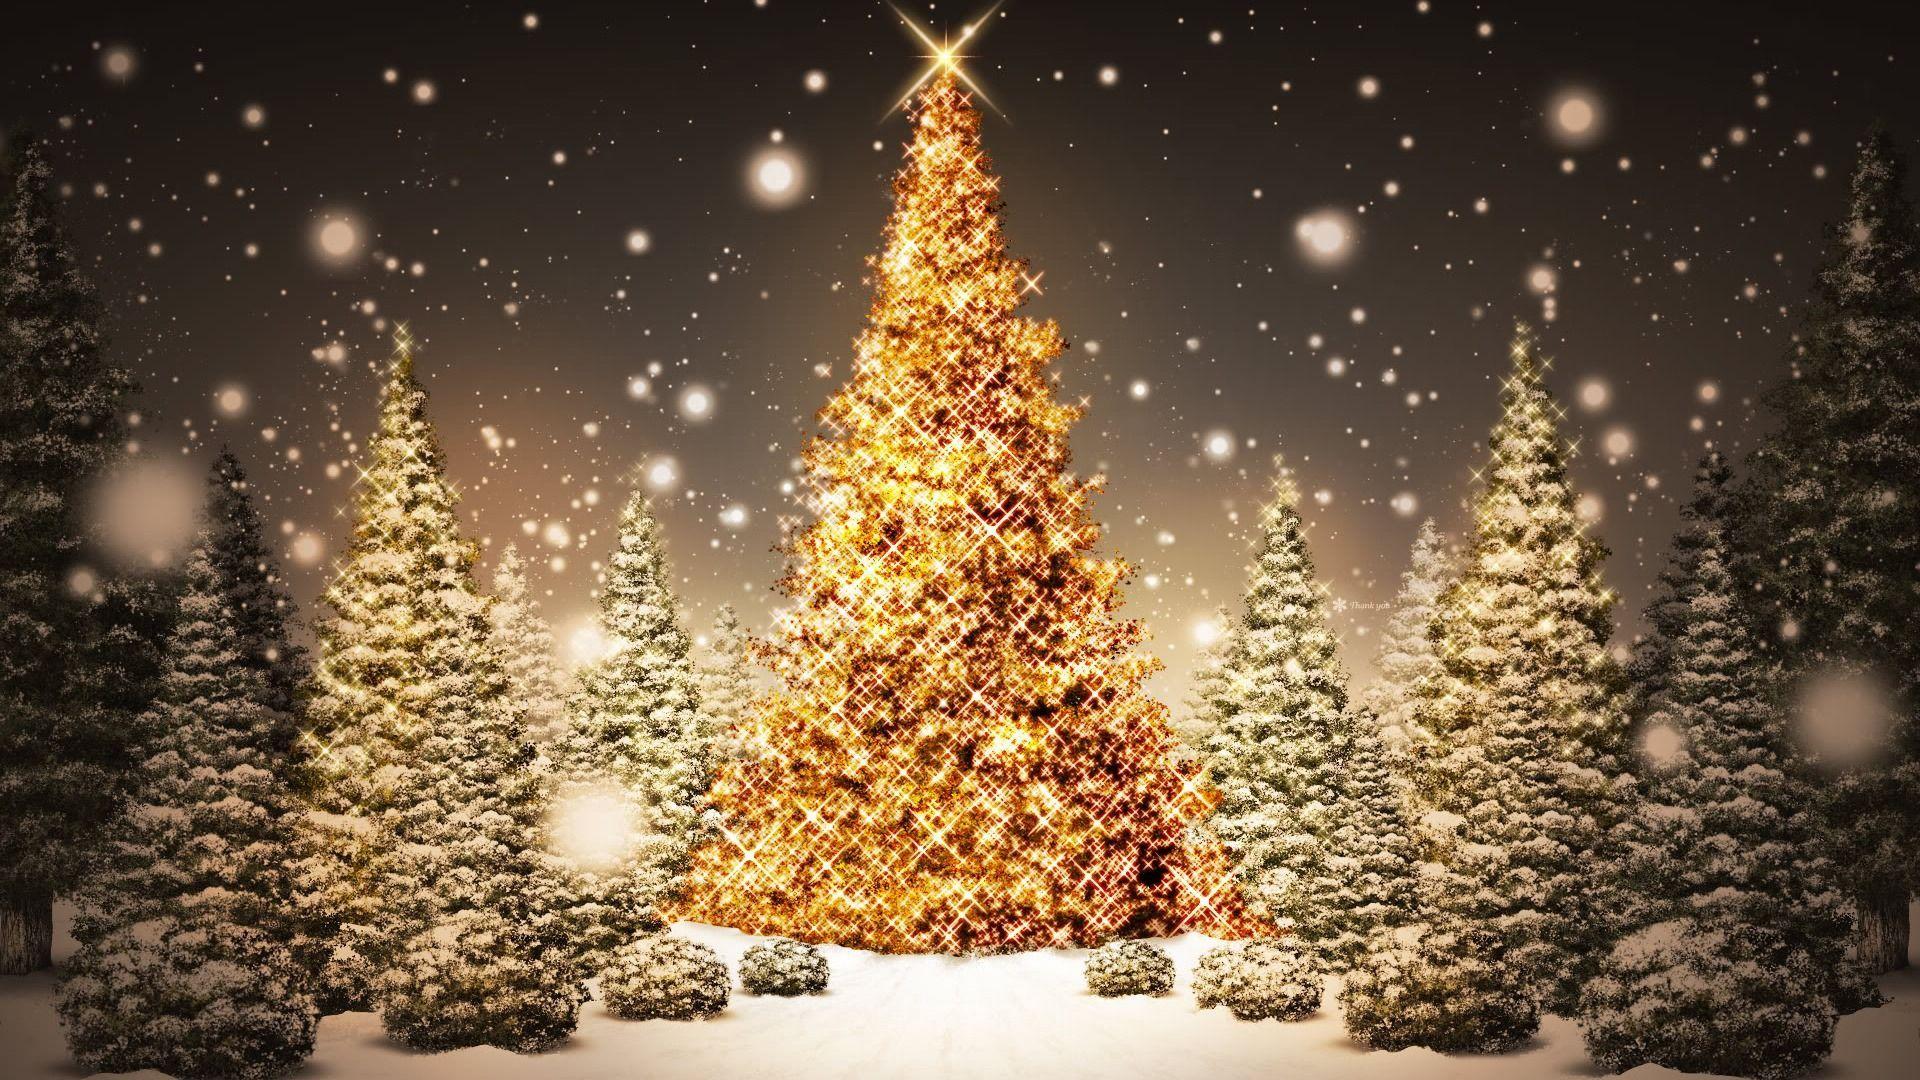 christmas magic - Google Search | Father Christmas | Pinterest ...